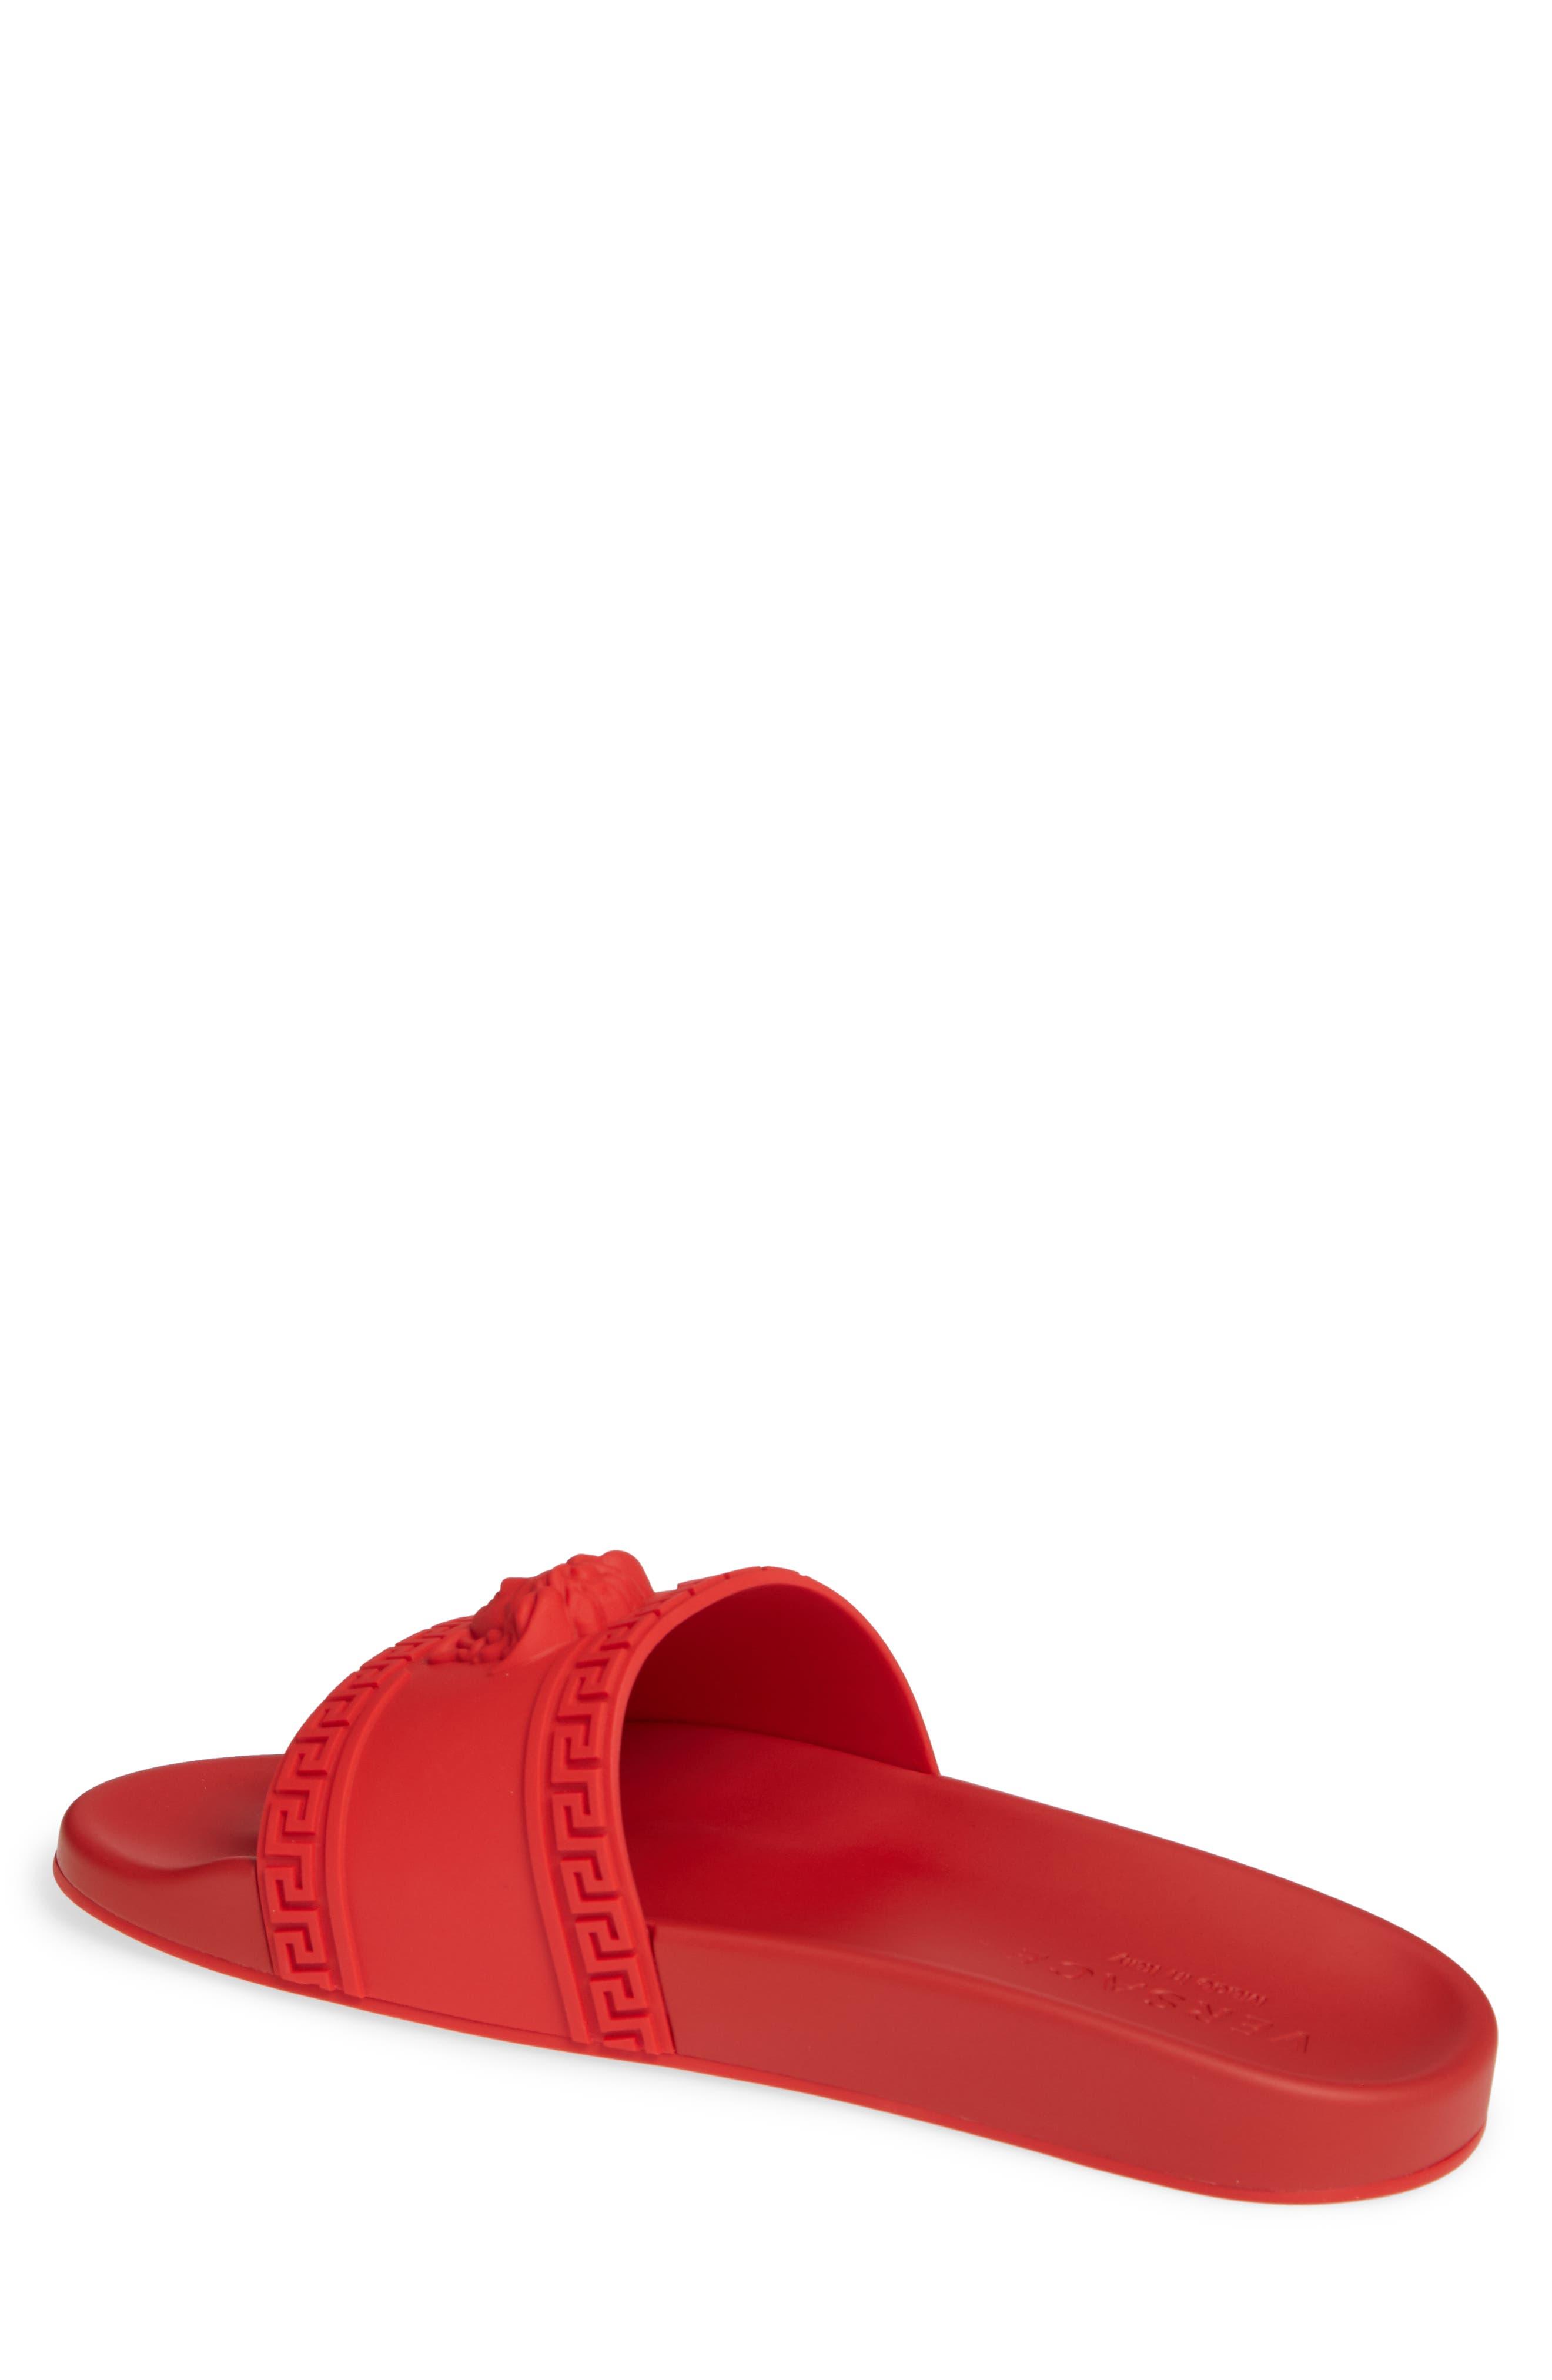 VERSACE, Palazzo Medusa Slide Sandal, Alternate thumbnail 2, color, RED